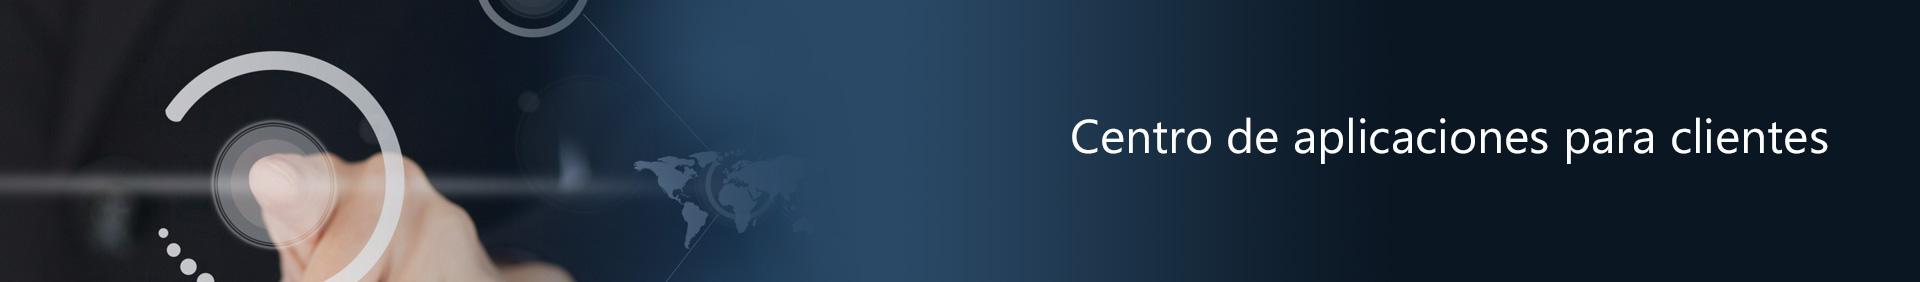 Centro aplicaciones para clientes